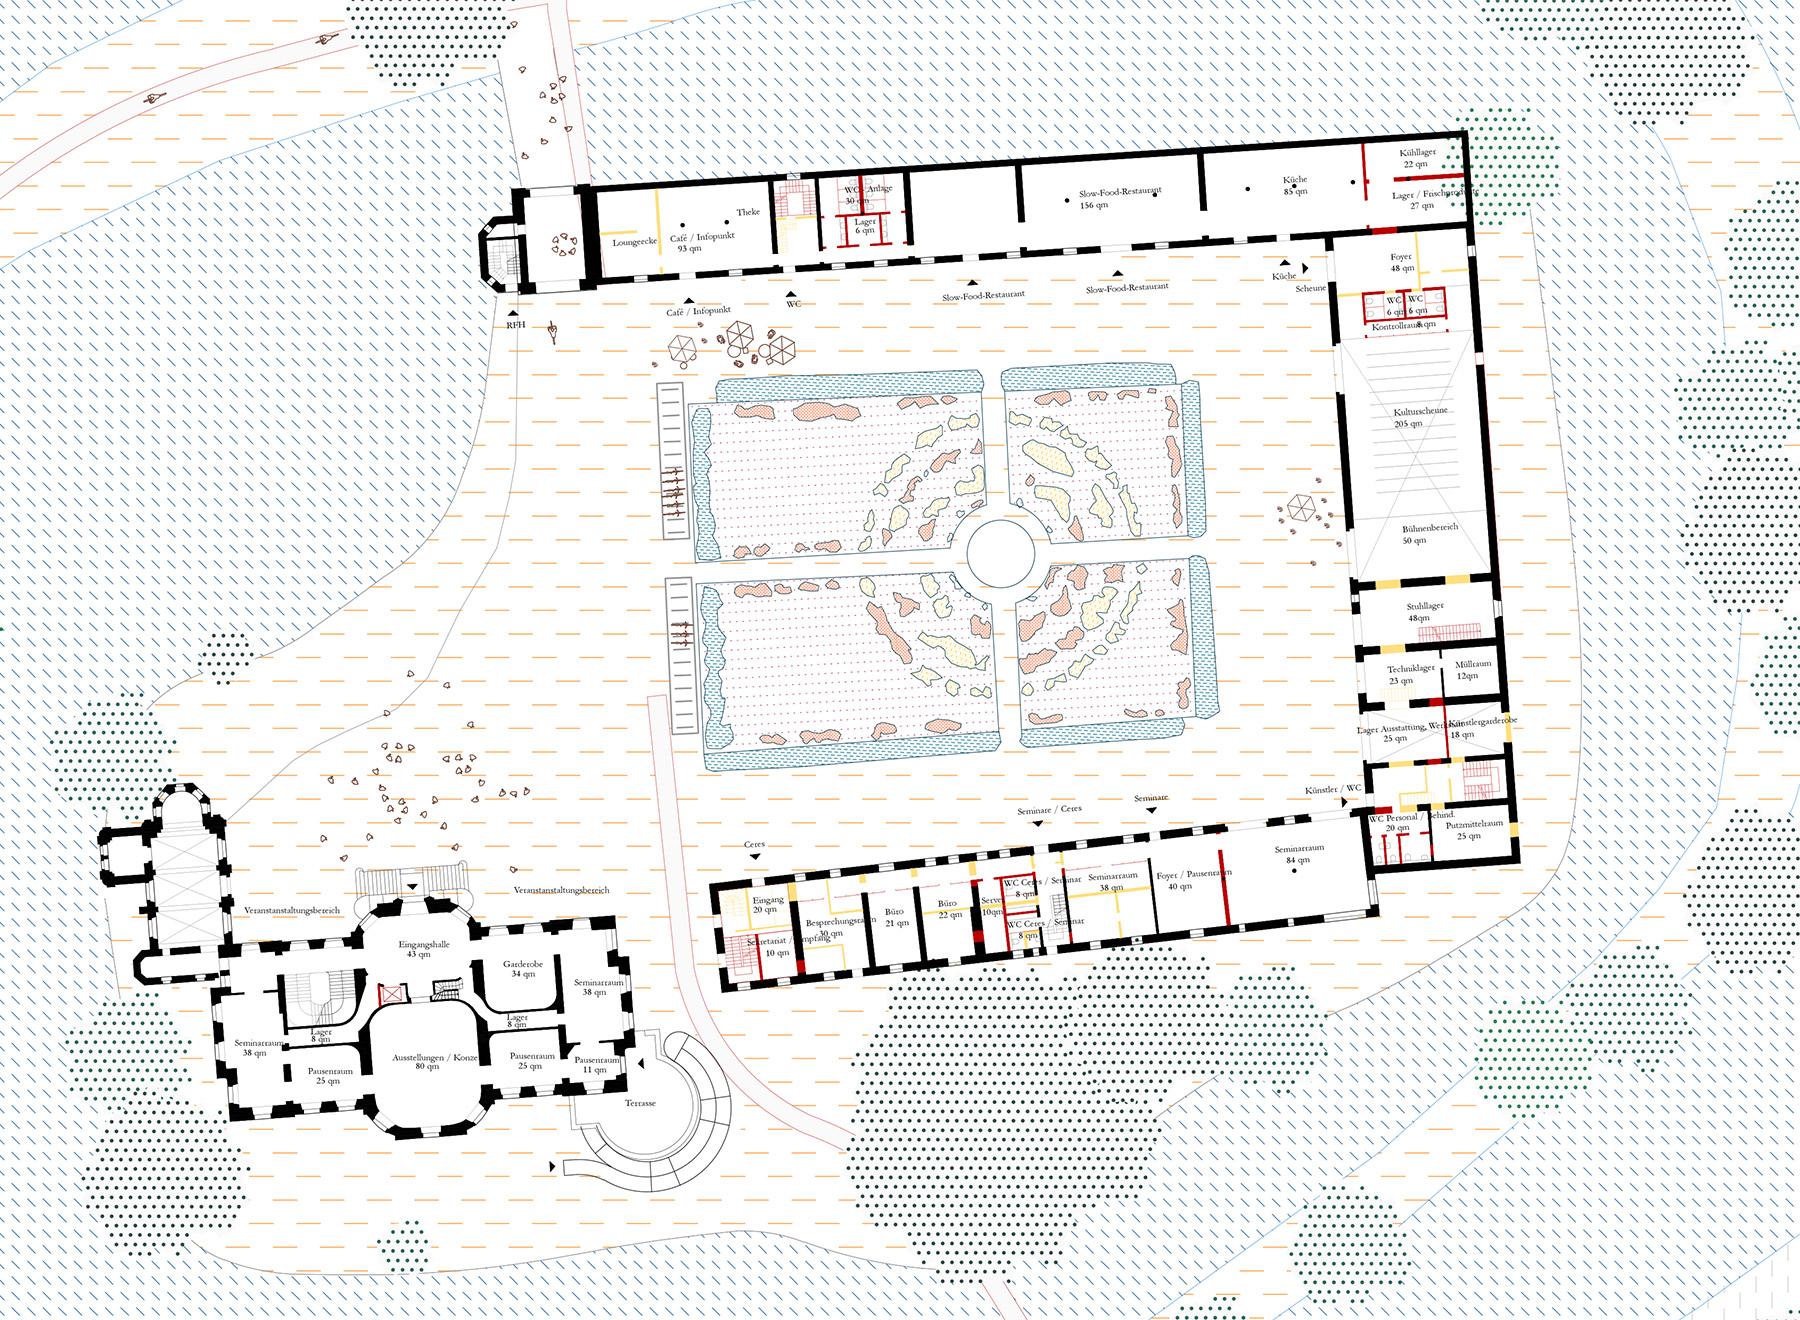 castle ground floor plan